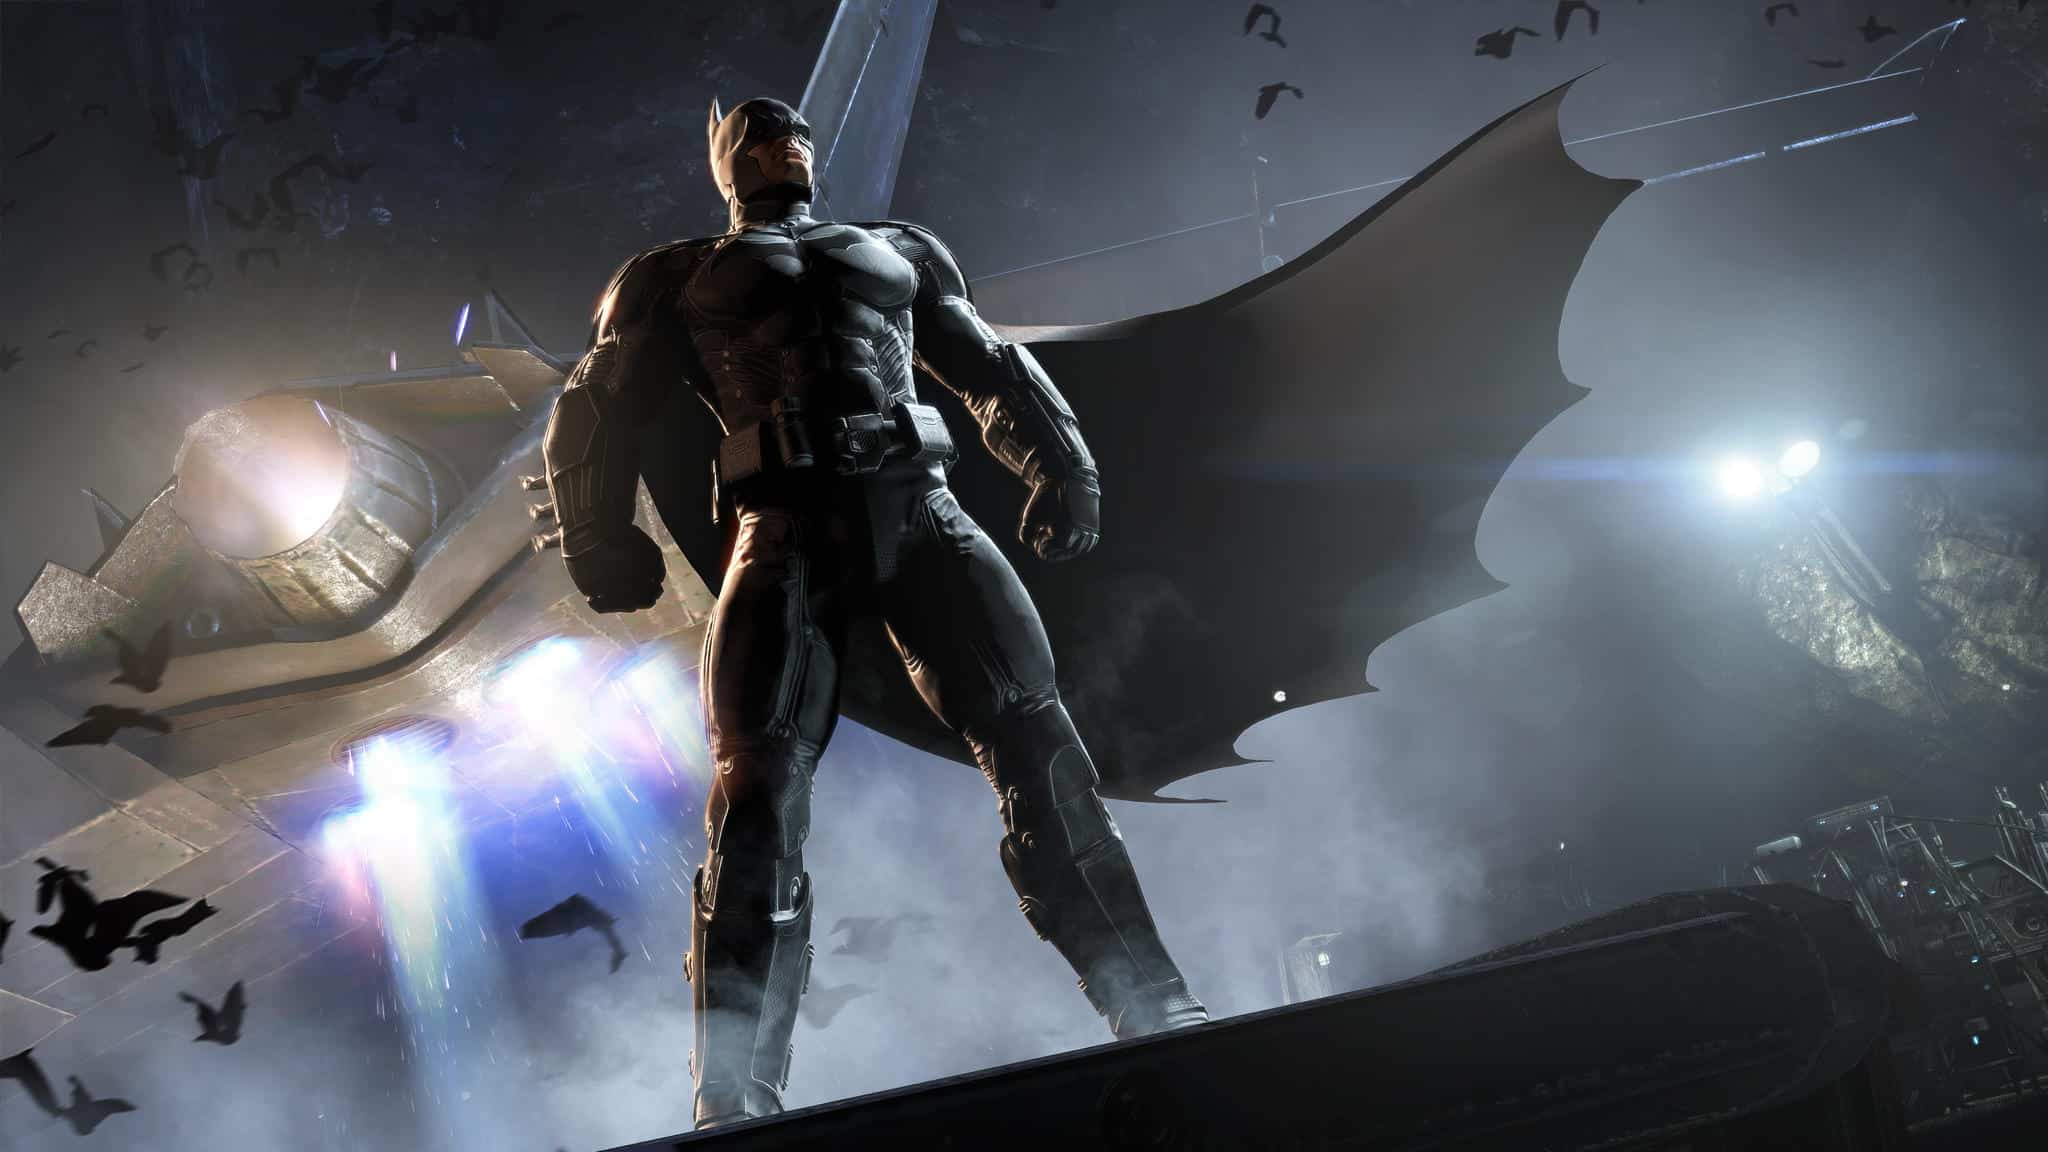 Batman Arkham Legacy WB Games New Batman Arkham Game Batman Arkham Origins Warner Bros. Games Court of Owls Roger Craig Smith